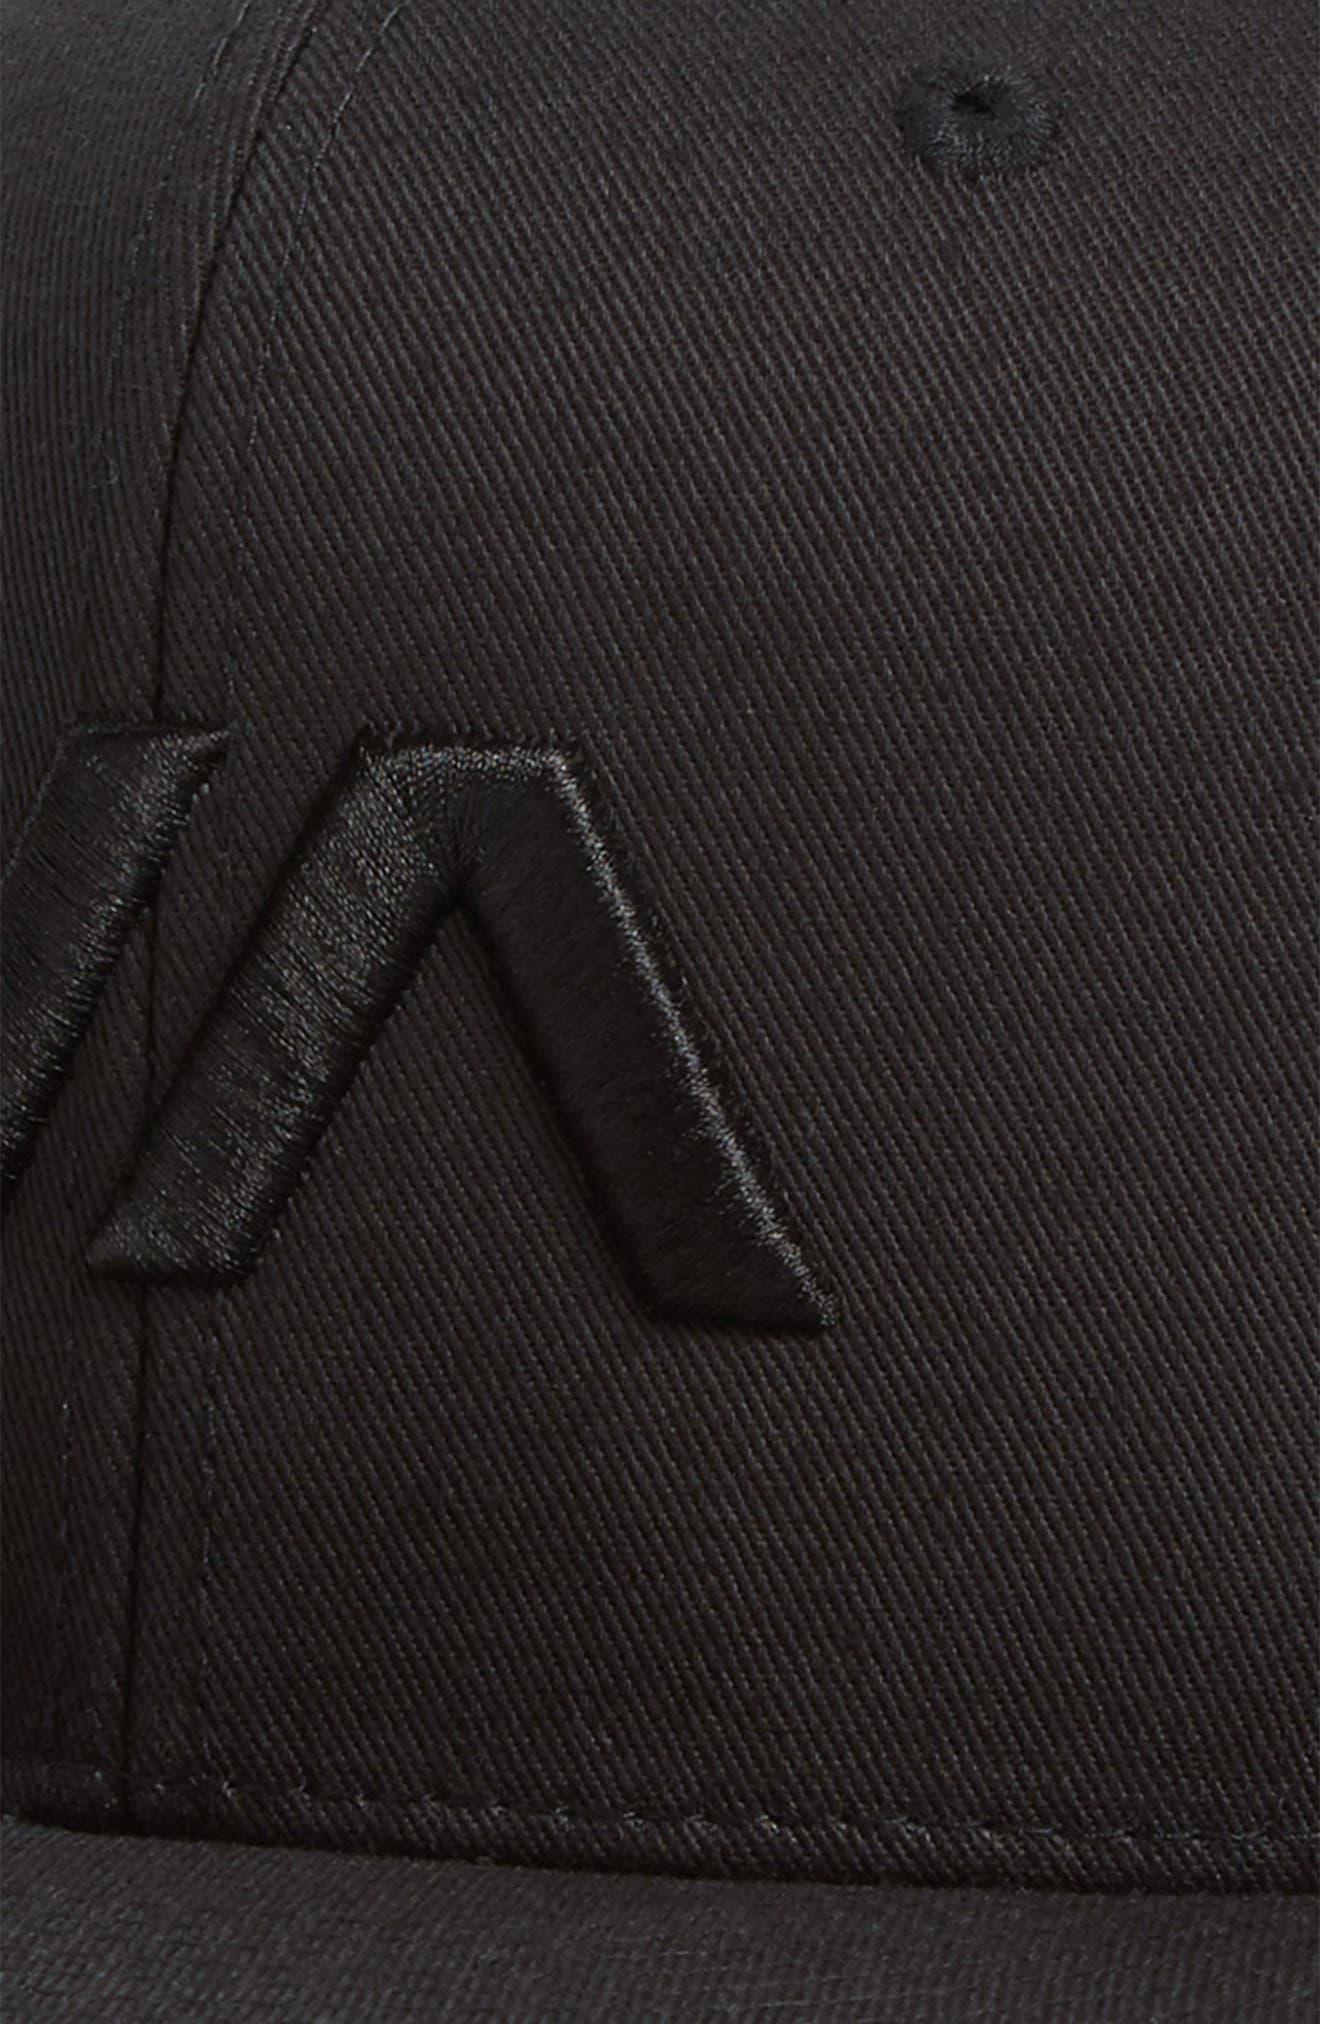 VA Snapback II Snapback Hat,                             Alternate thumbnail 3, color,                             BLACK/ BLACK